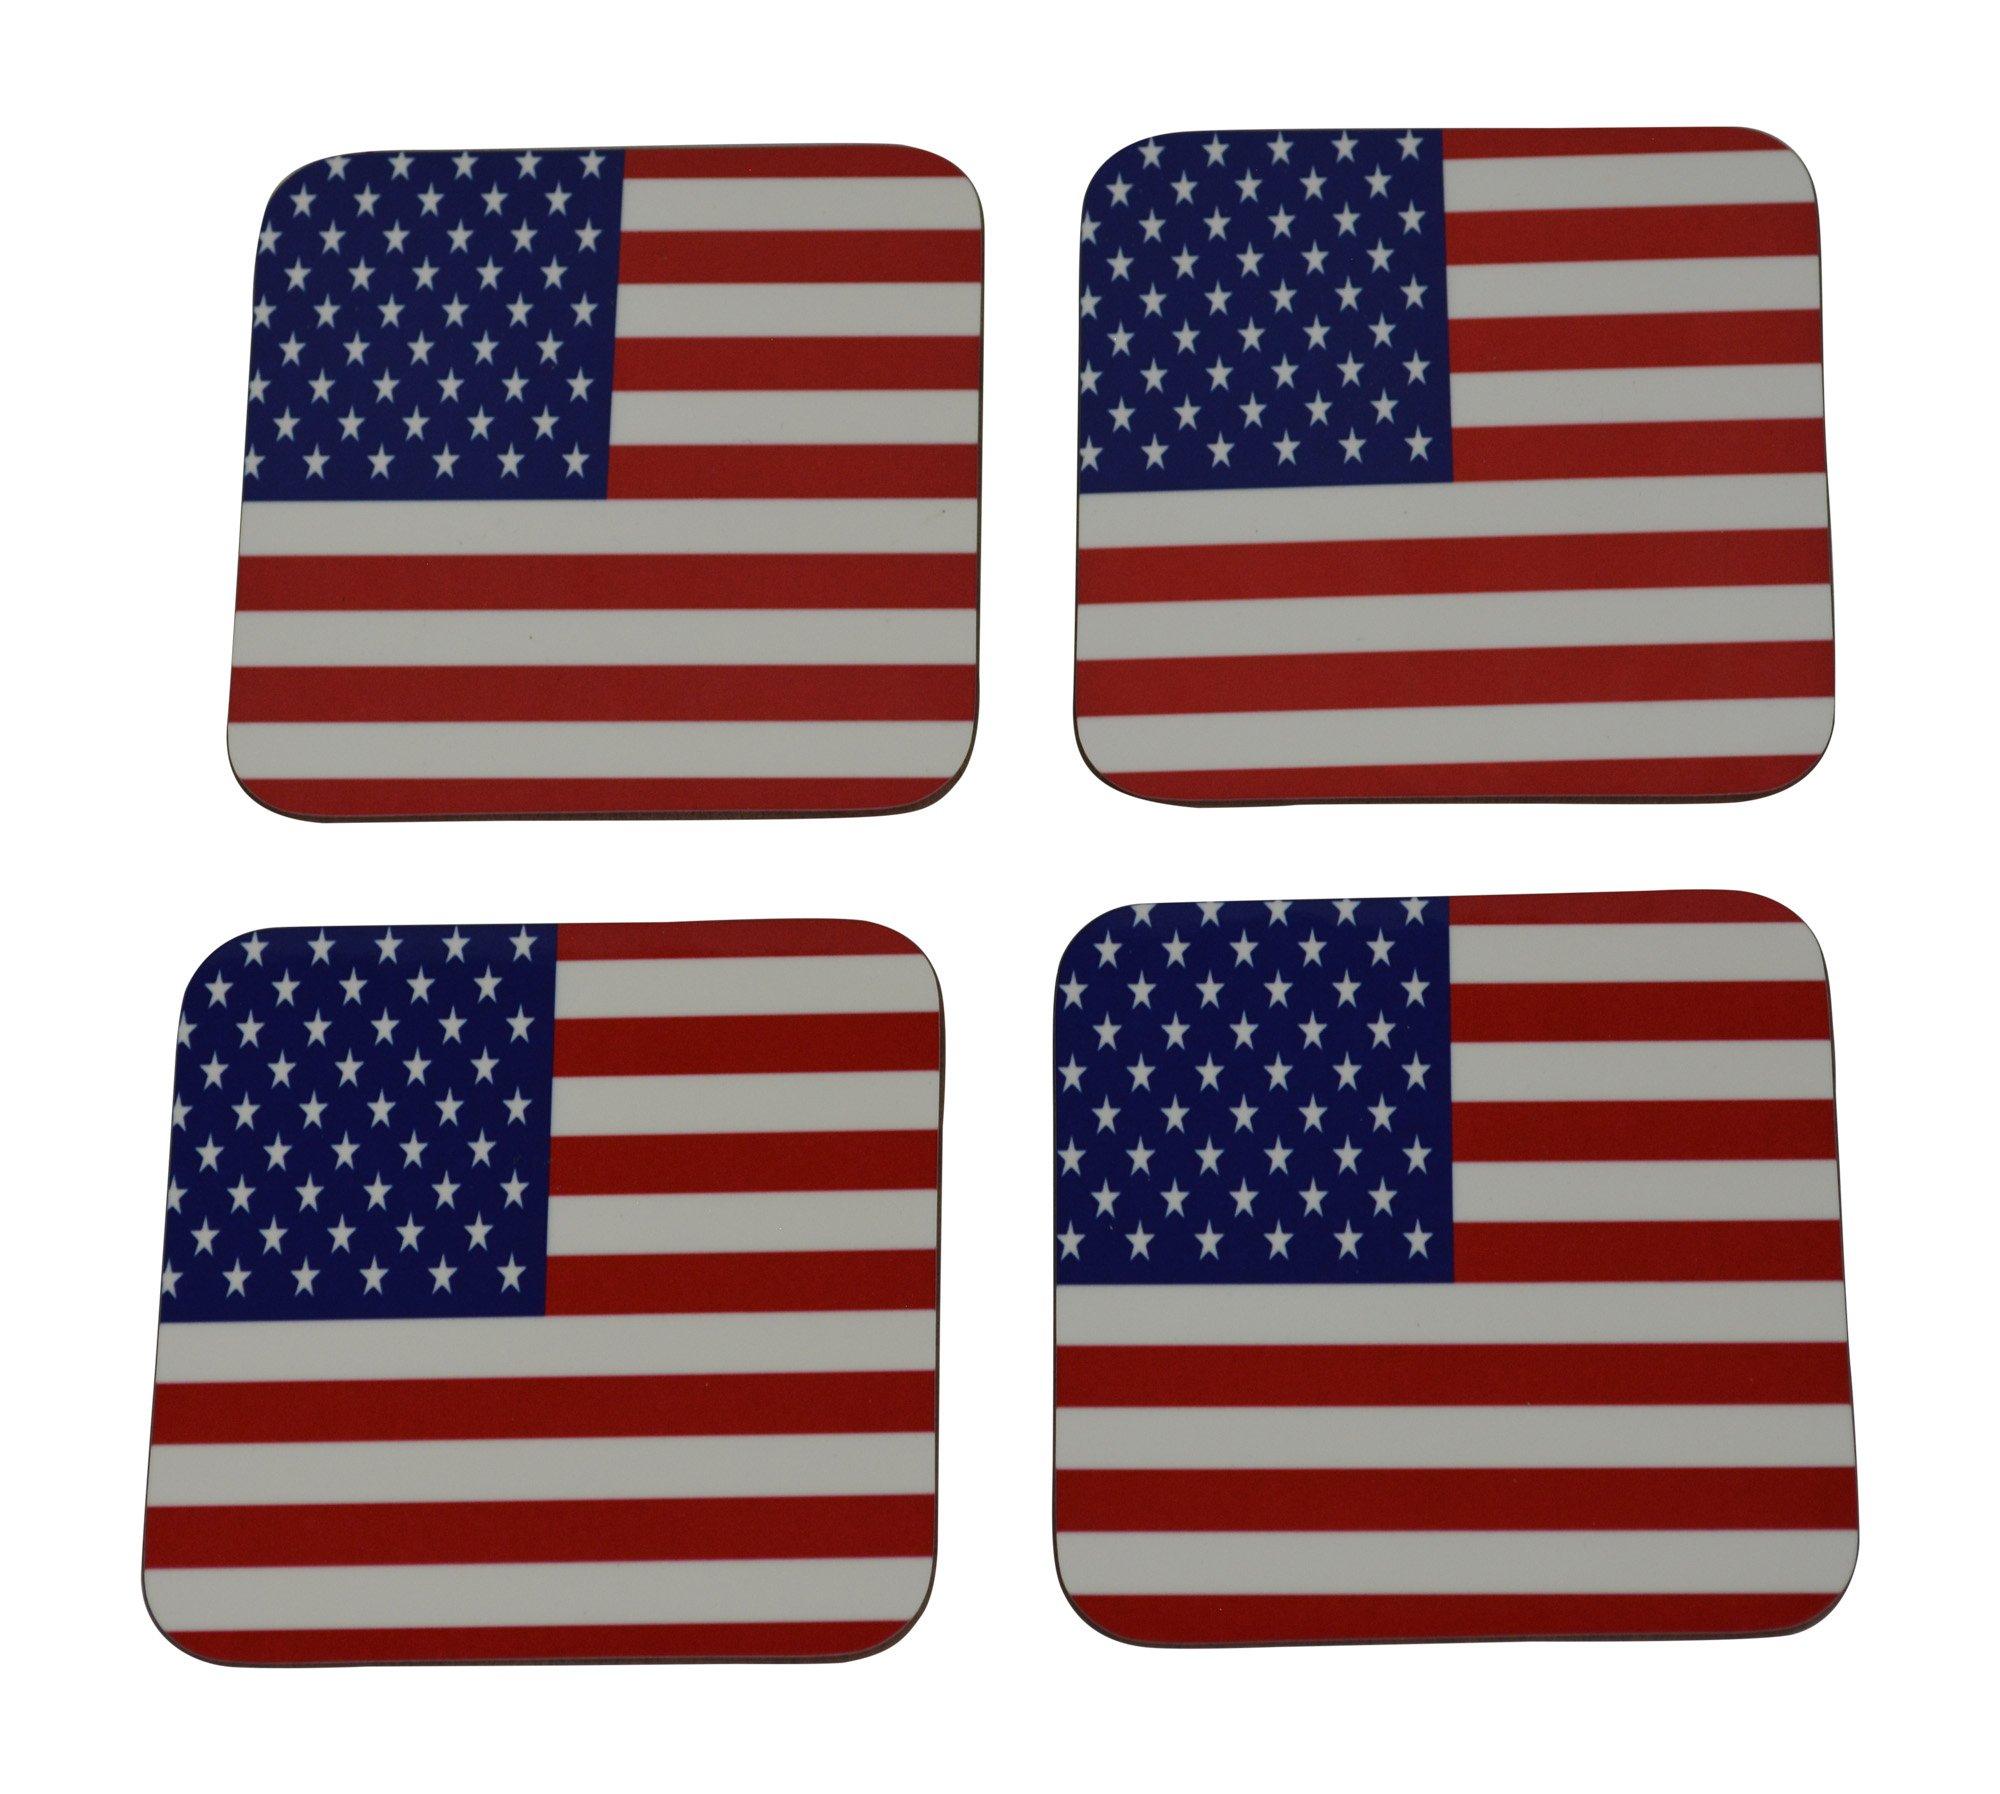 Patriotic USA Flag Drink Coaster Set Gift United States of America Home Kitchen Bar Barware Old Glory